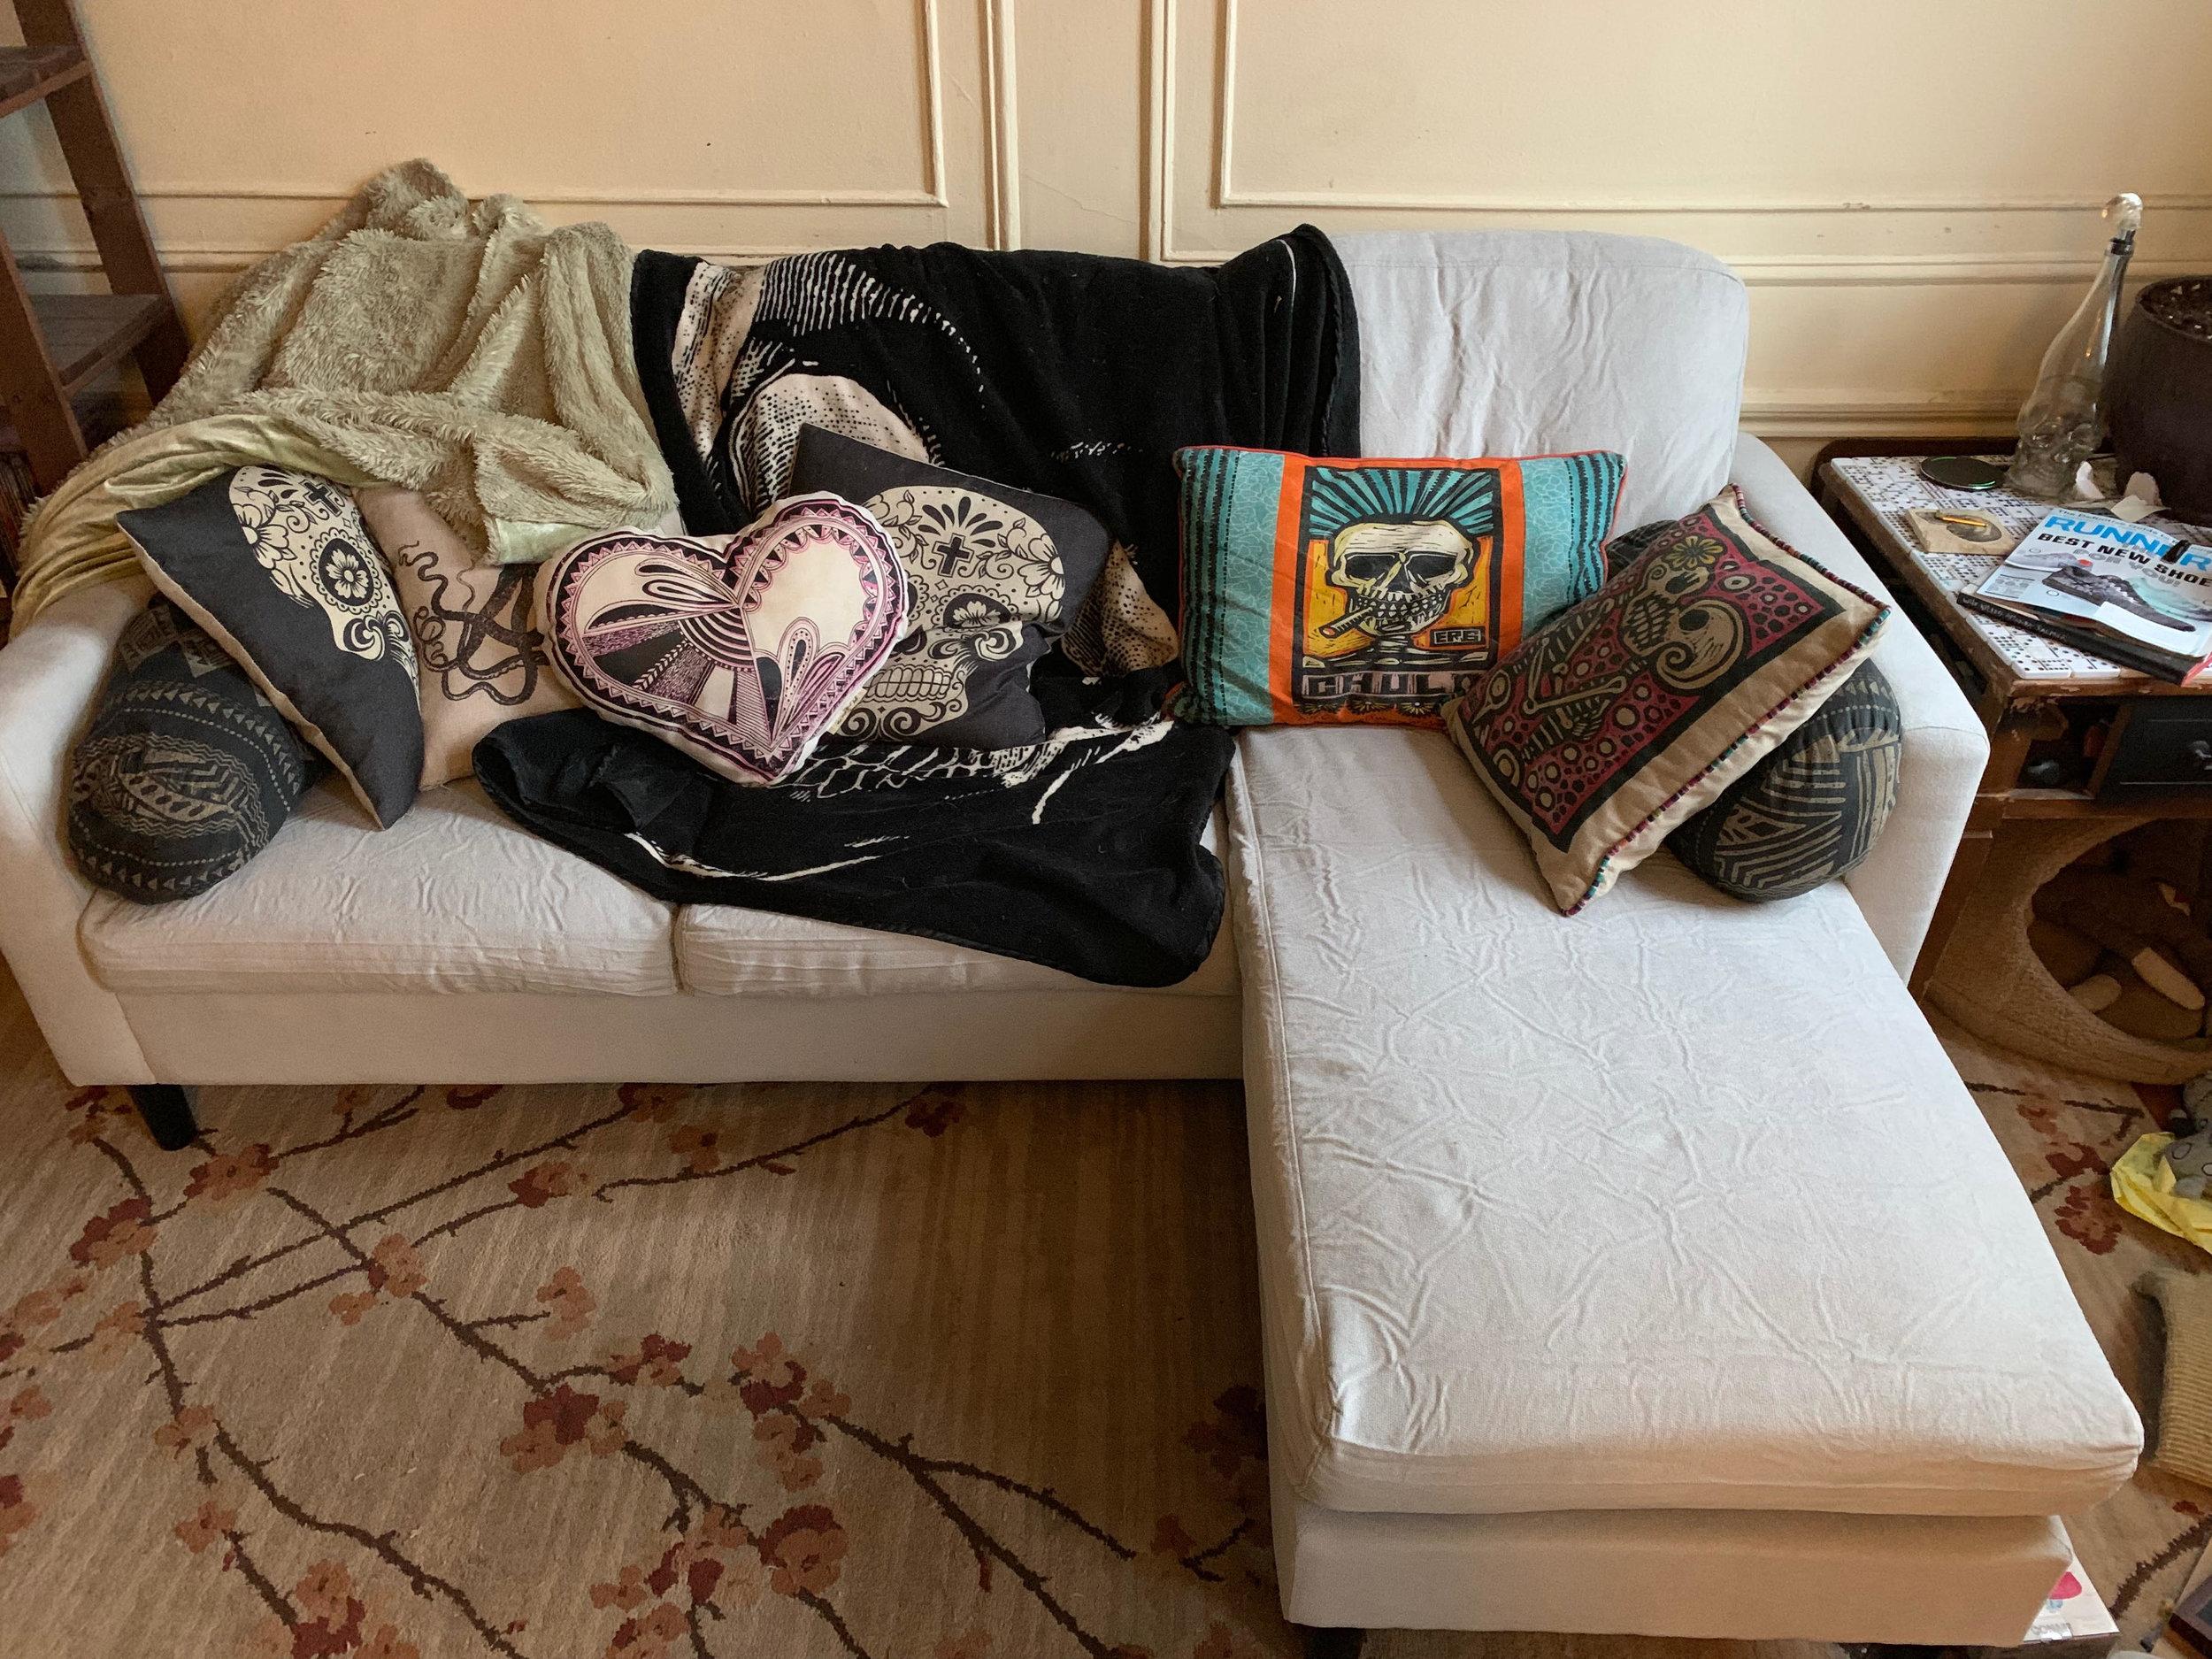 So many throw pillows…